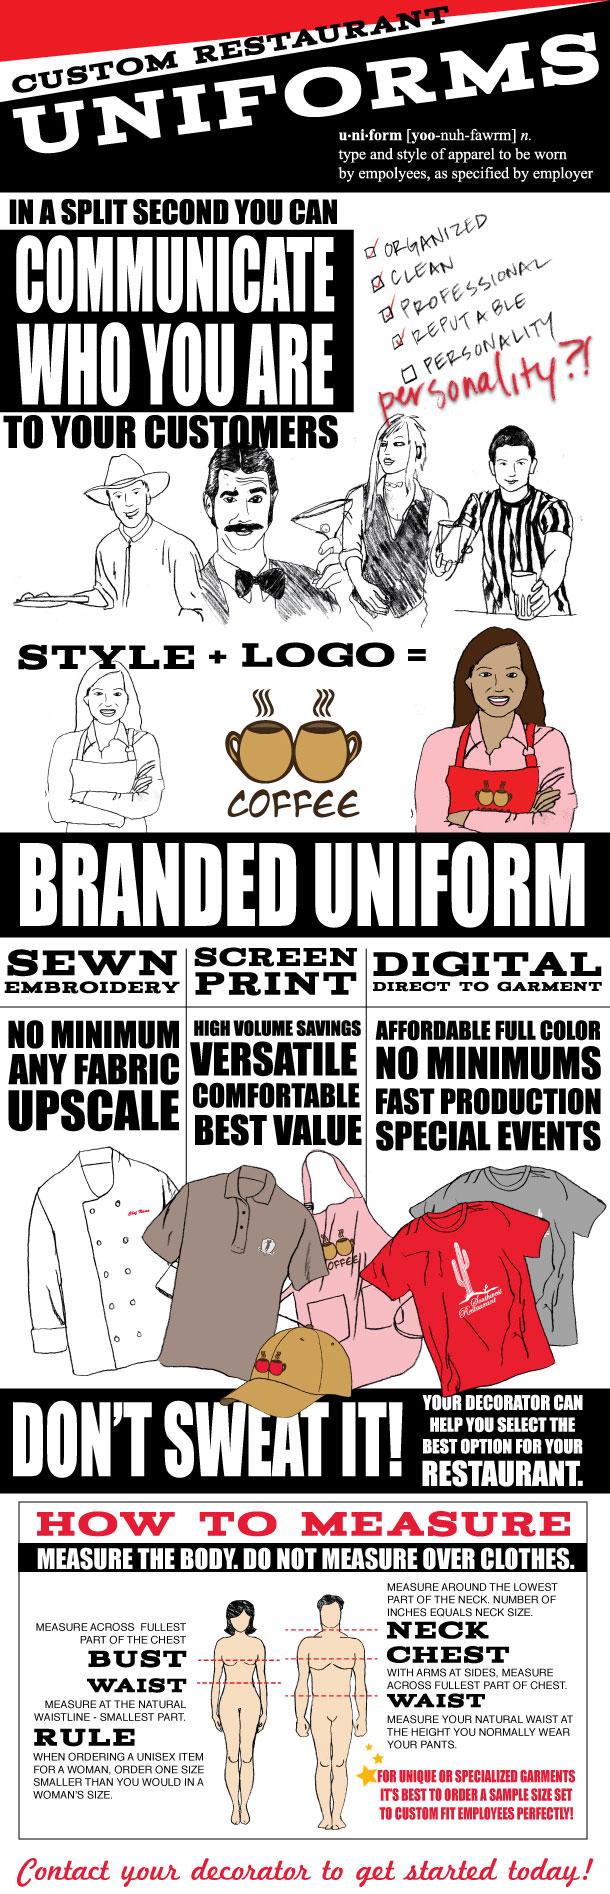 Custom Restaurant Uniforms Infographic